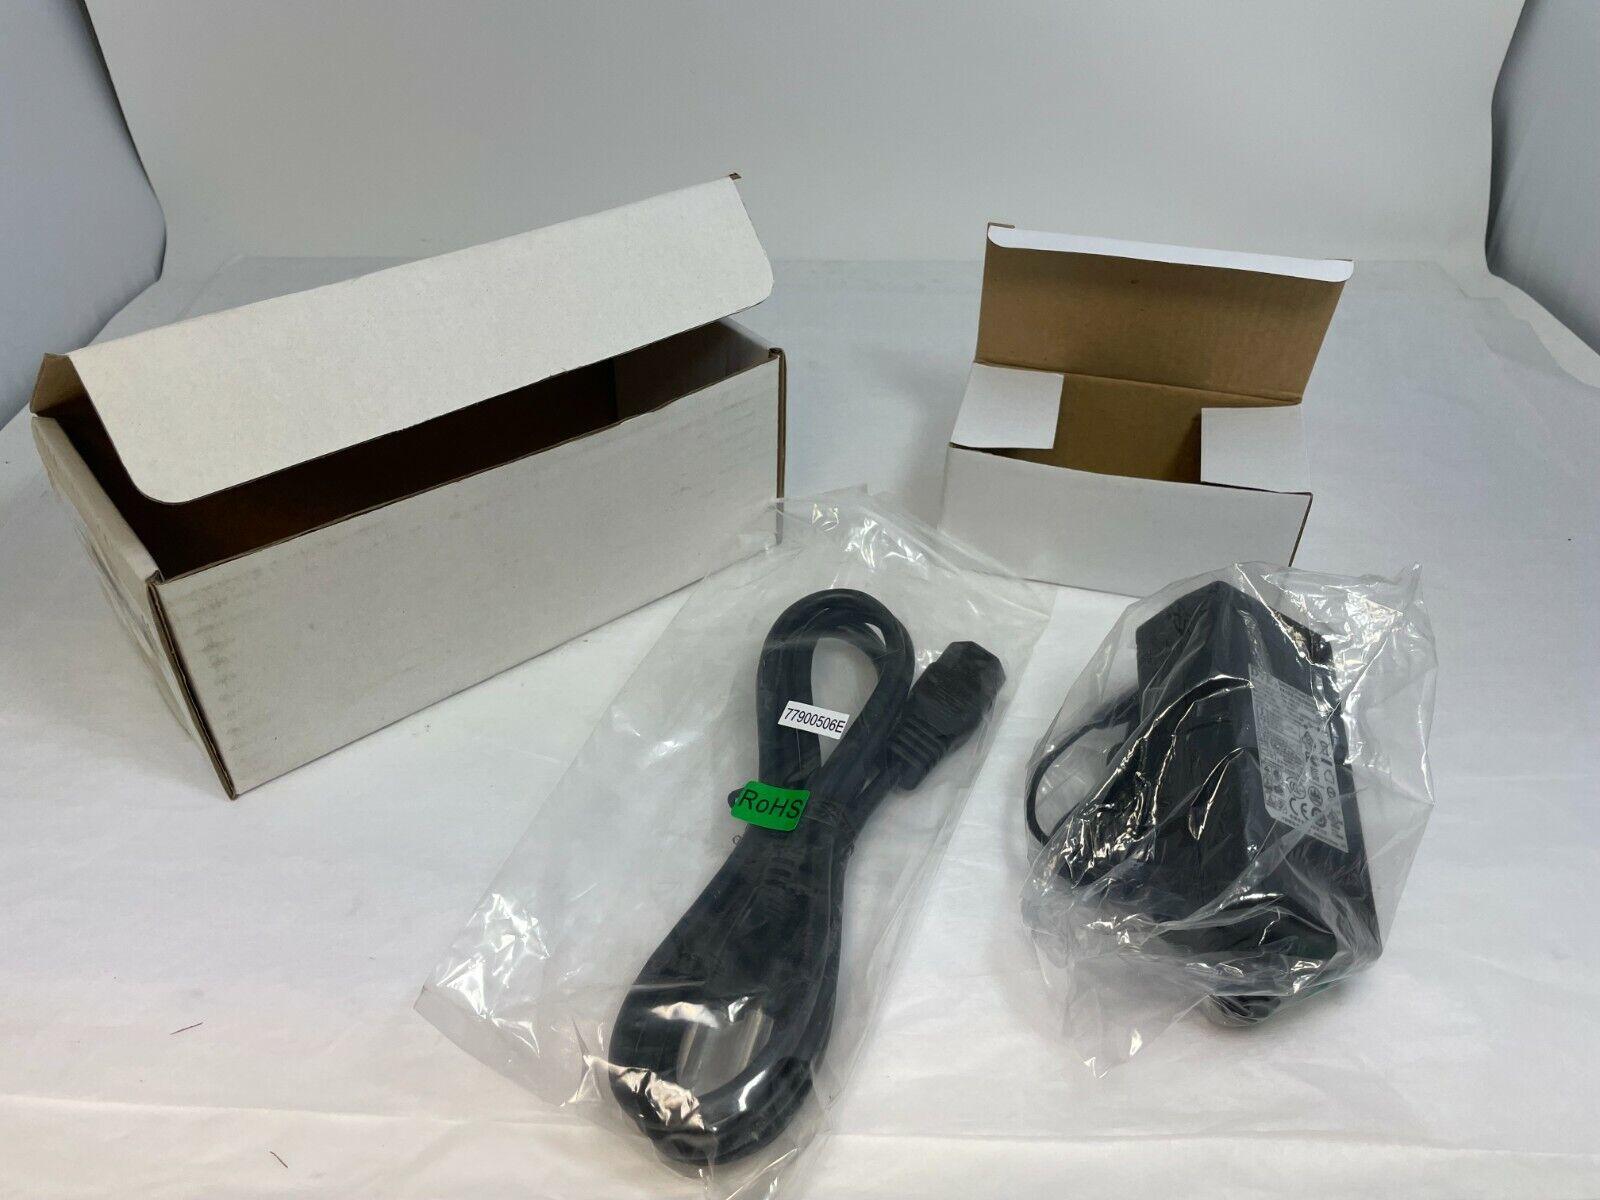 Honeywell PS-120-1500D-NA US power supply, 12 volt, 1.5 amp barrel connector